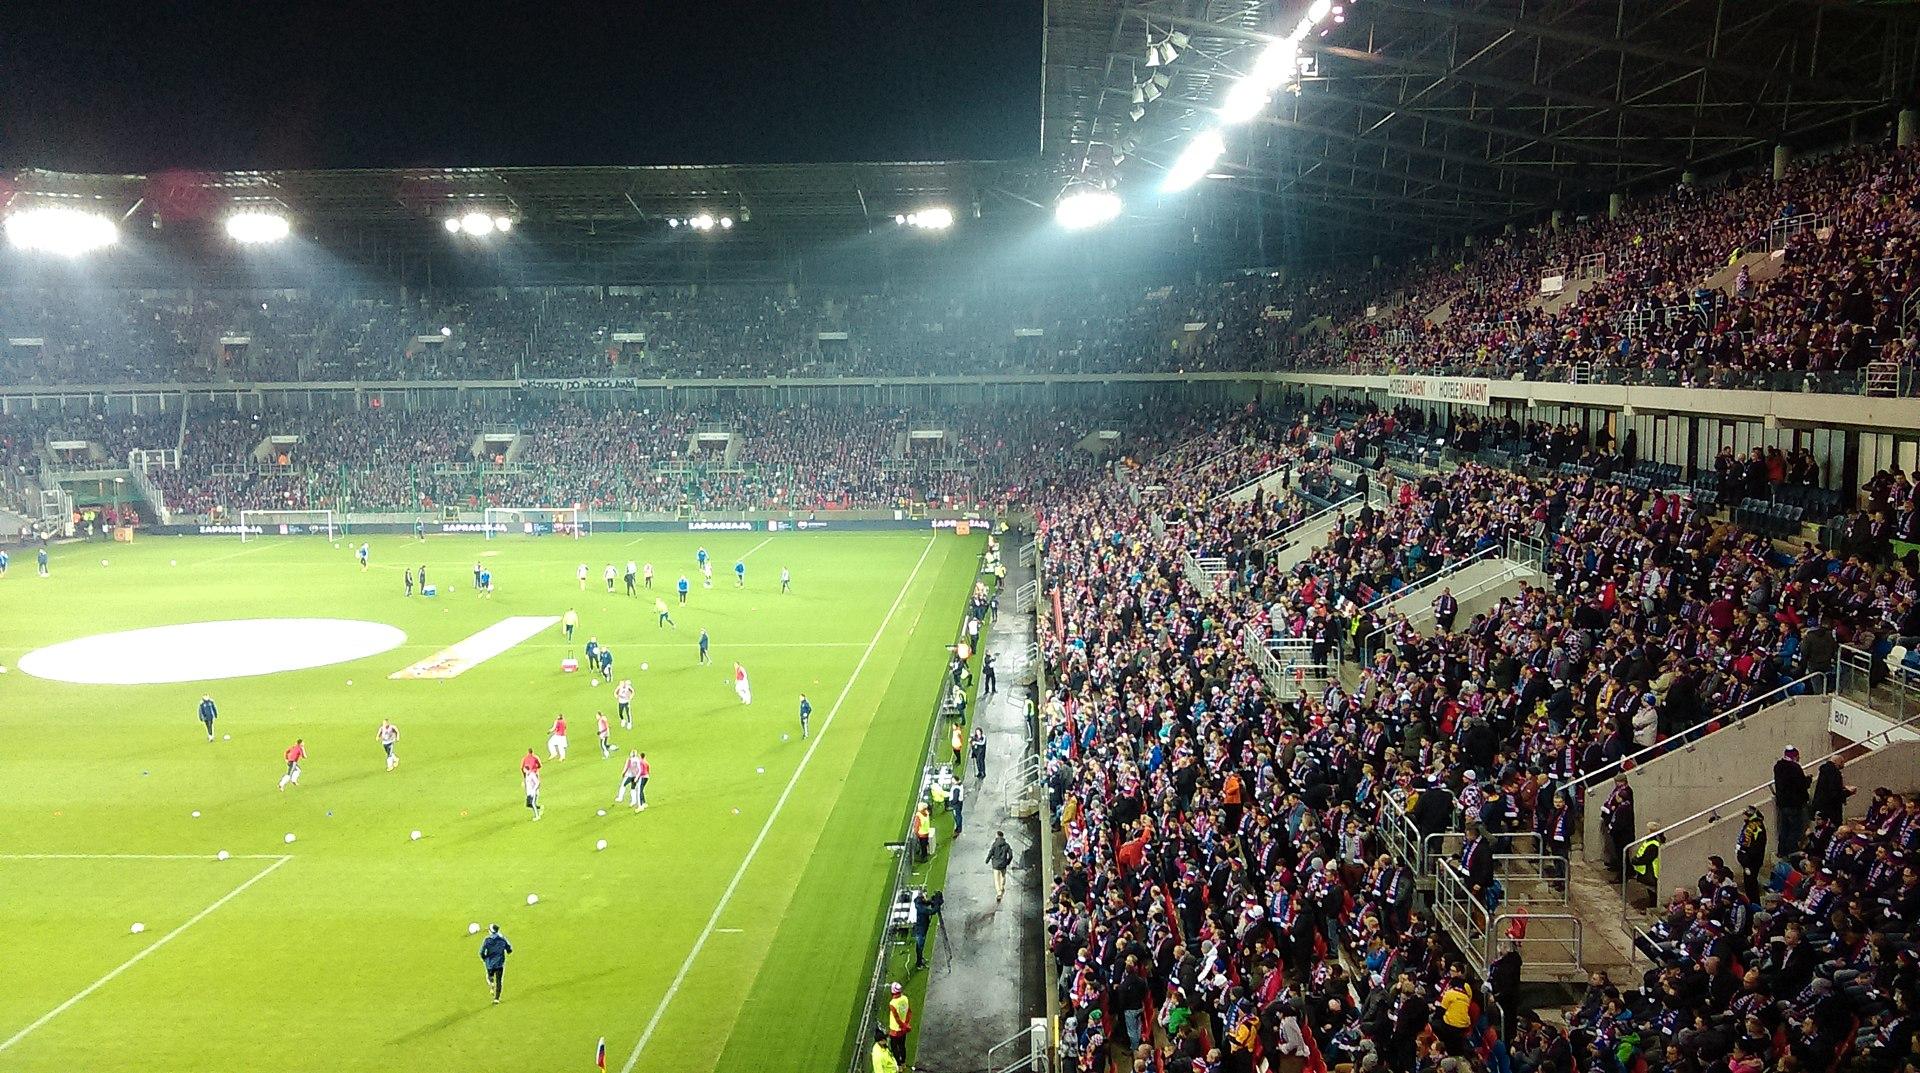 Ernest Pohl Stadium - Zabrze 2.jpg